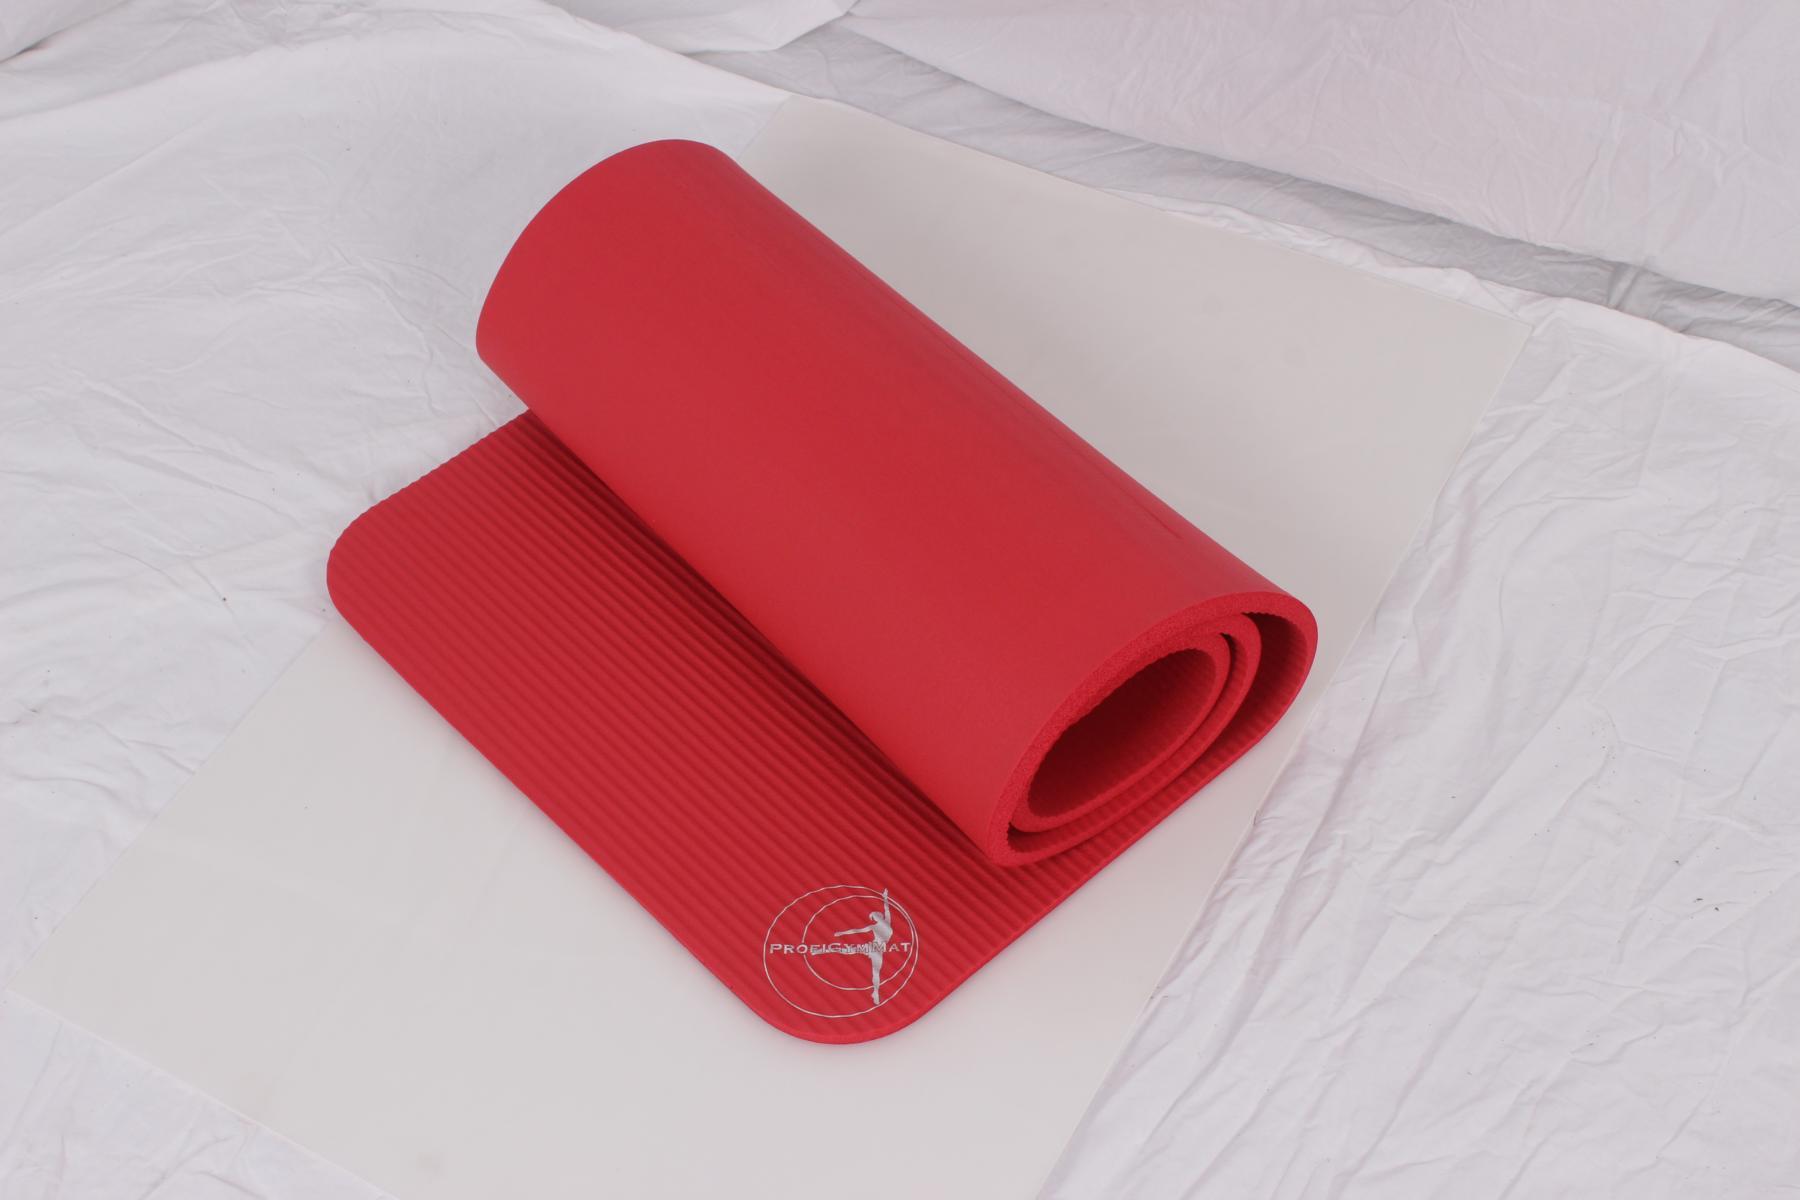 Profigymmat Gymnastikmatte 180 x 60 x 1,5 cm - Farbe rot